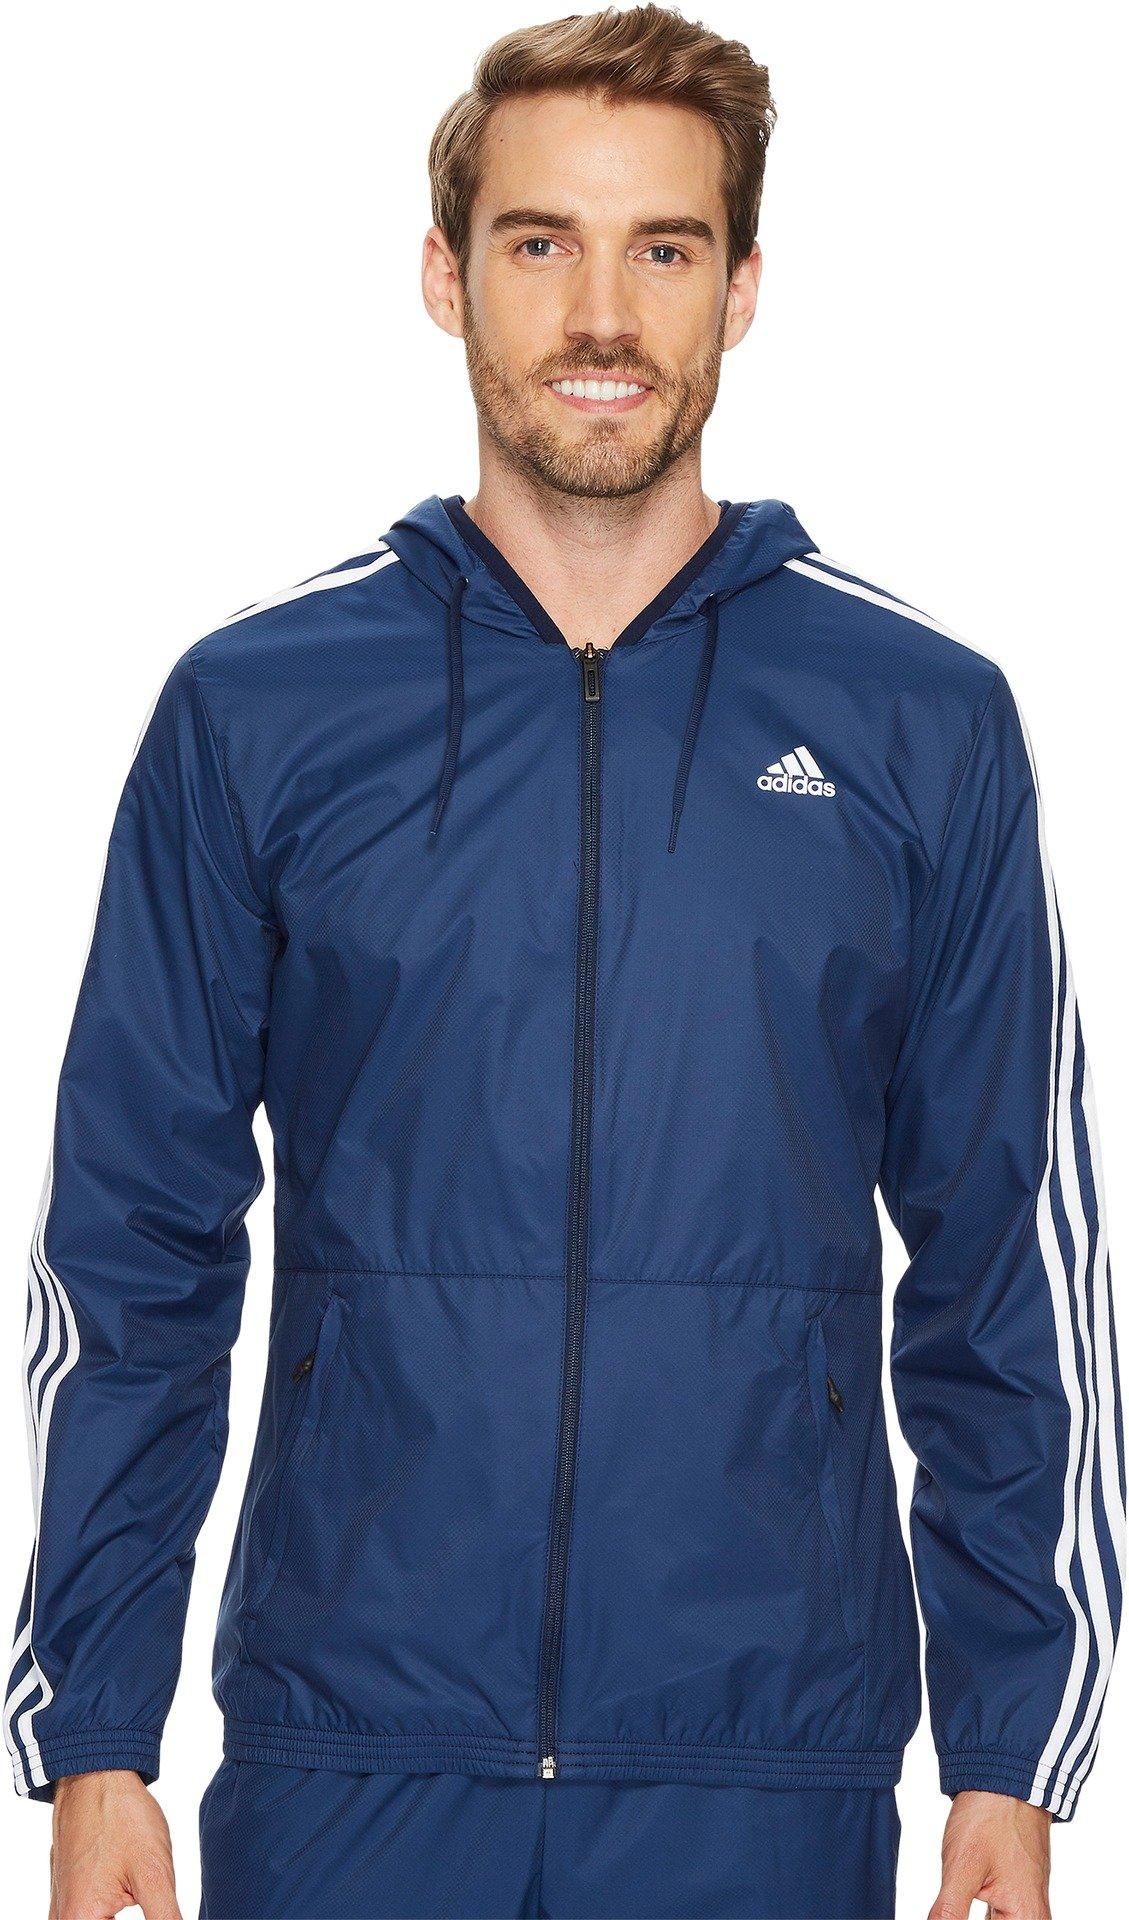 adidas Men's Essentials Wind Jacket, Collegiate Navy/Collegiate Navy/White, Medium